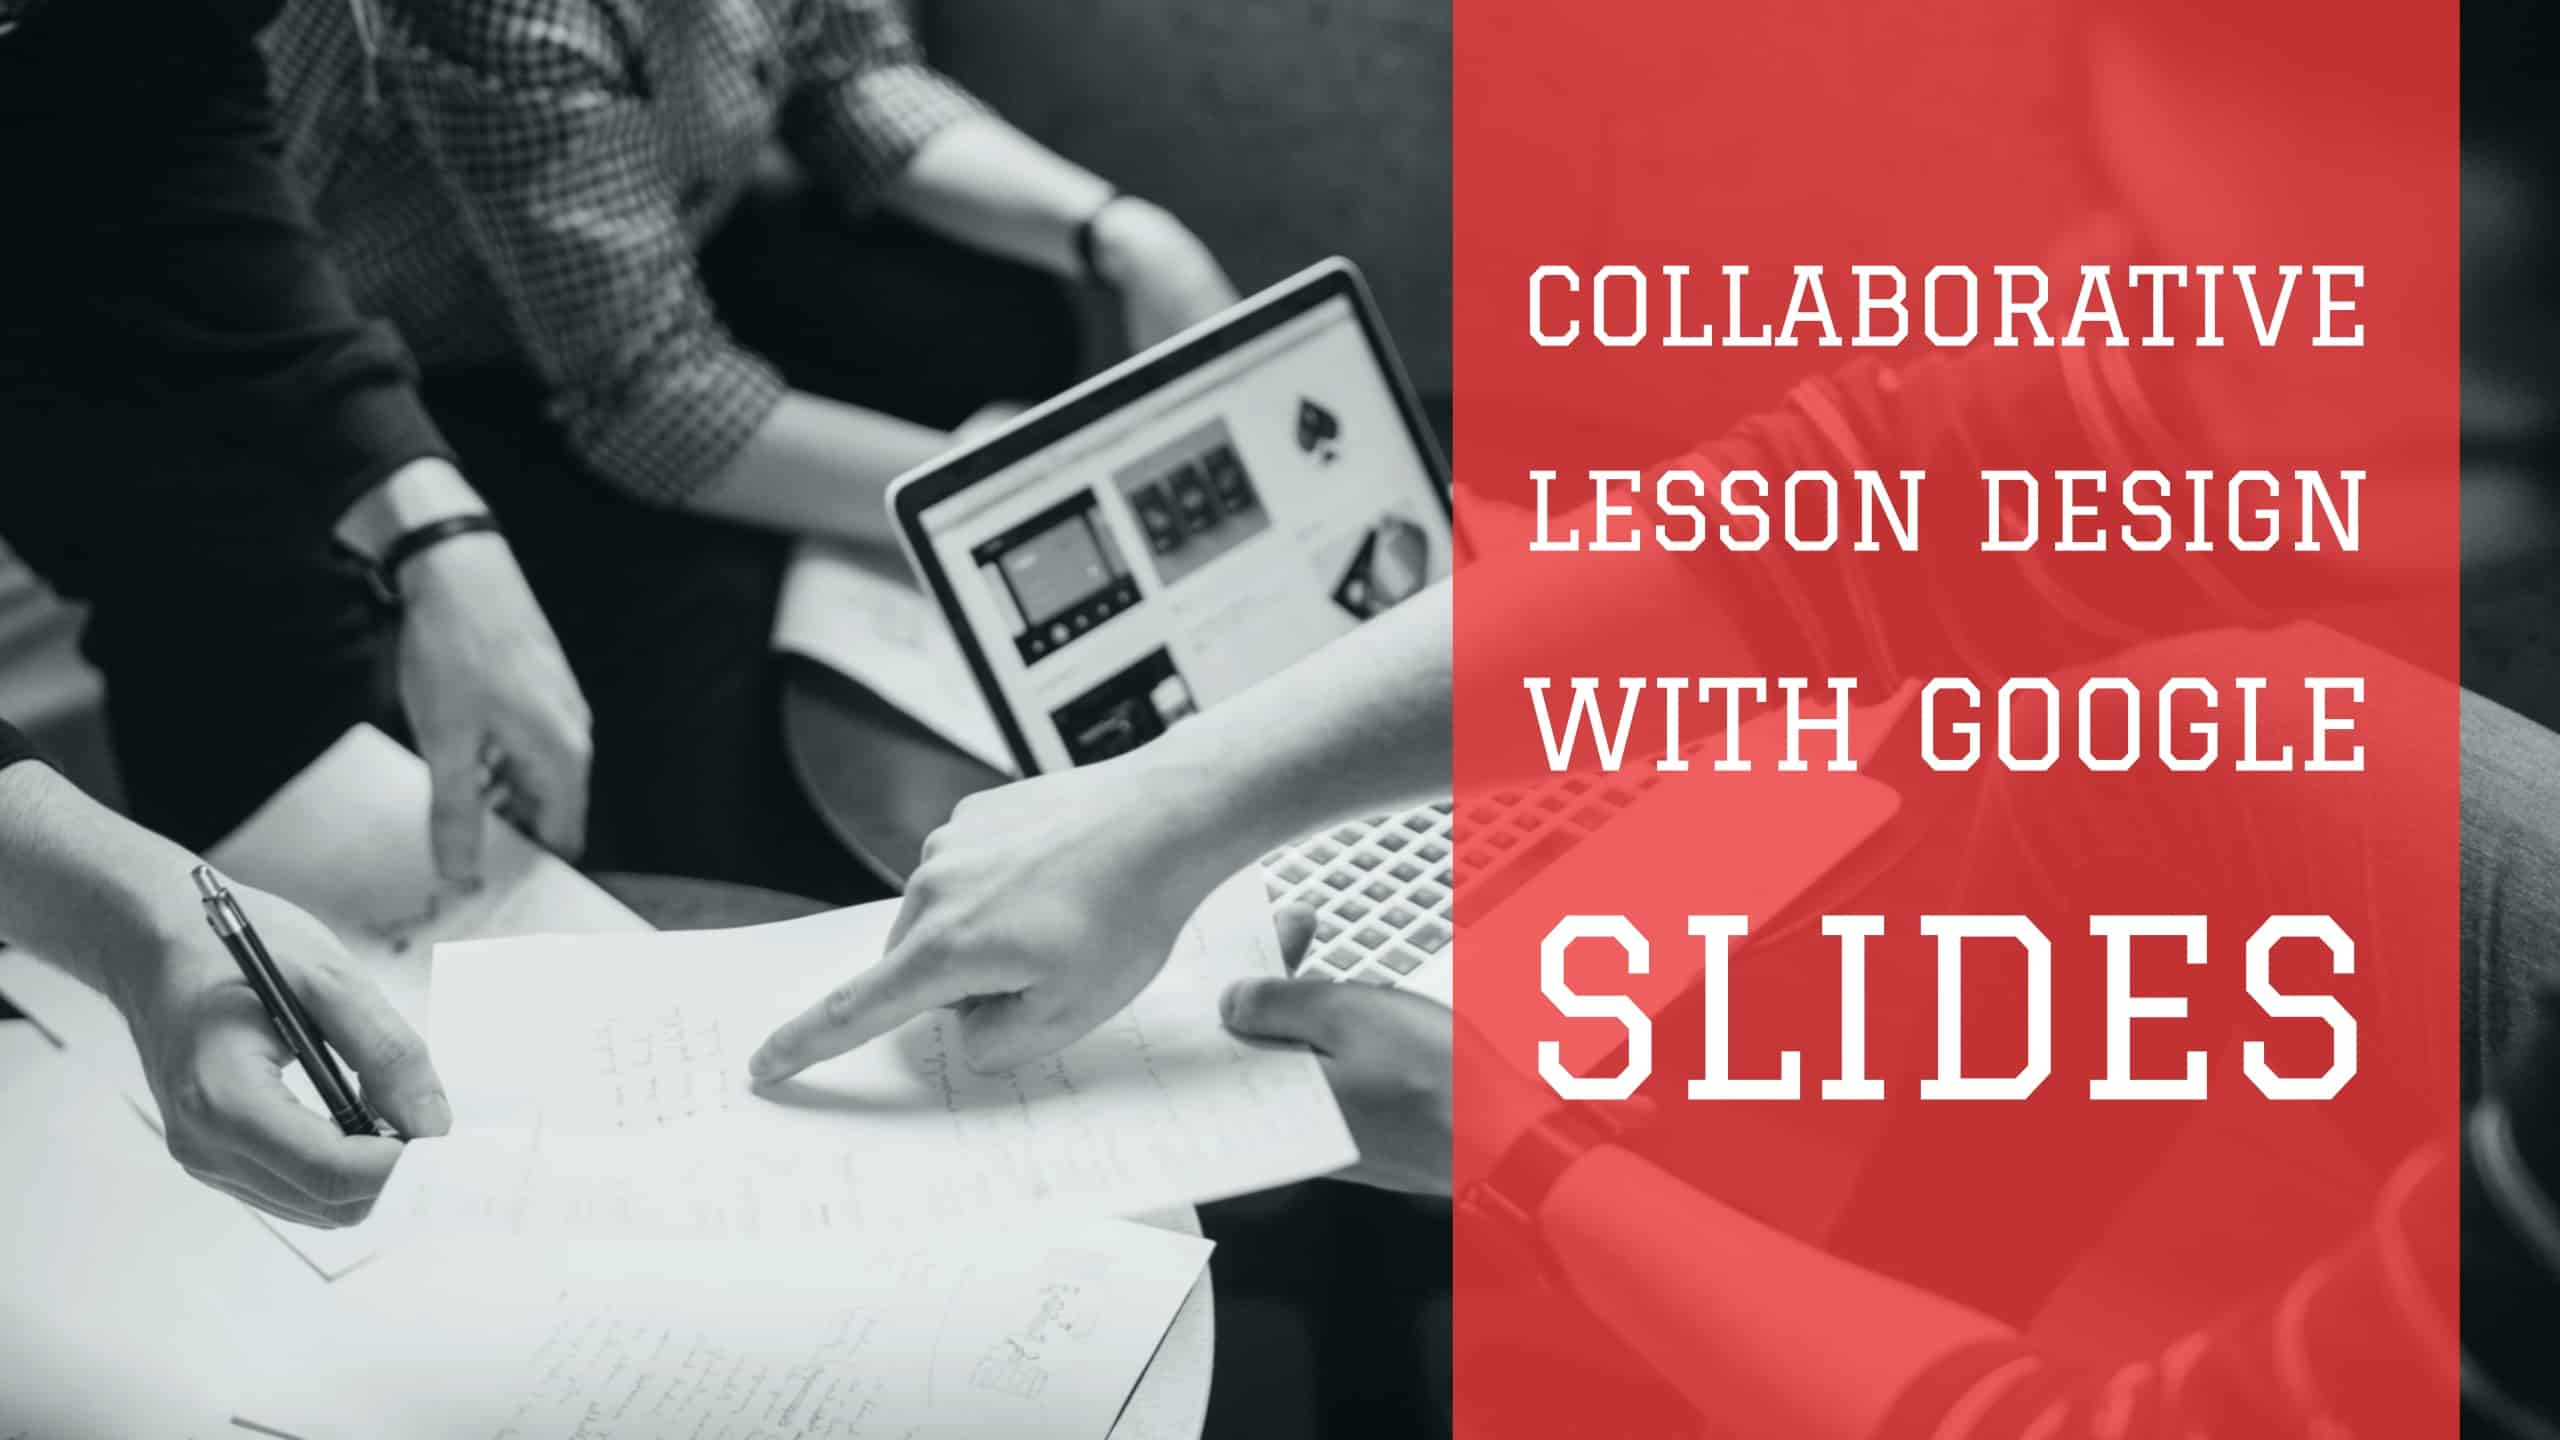 Collaborative Lesson Design with Google Slides